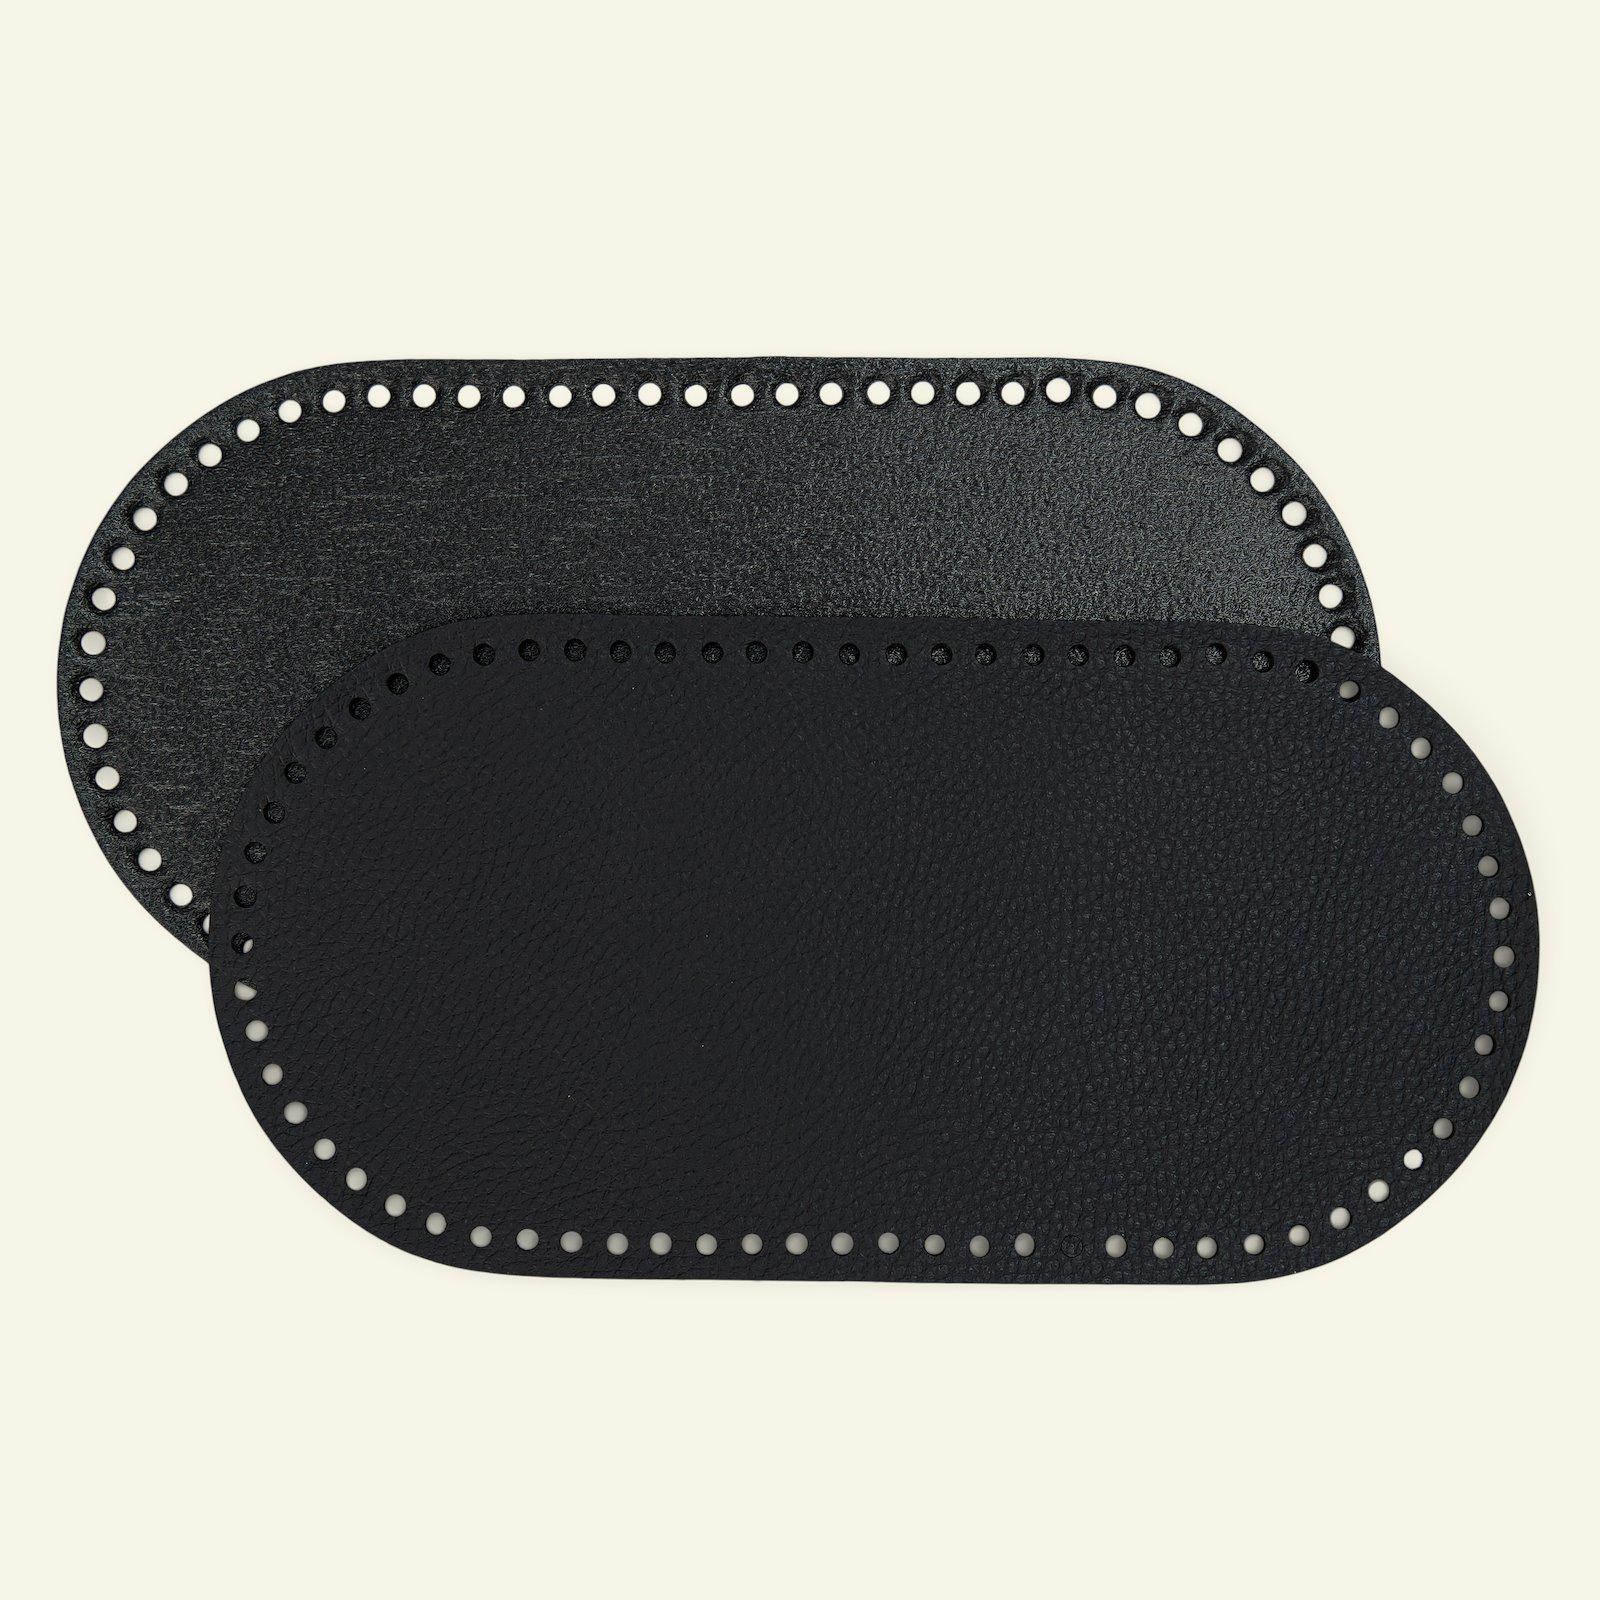 FRAYA Taschen-/Korbboden 15x30cm S., St. 83313_pack